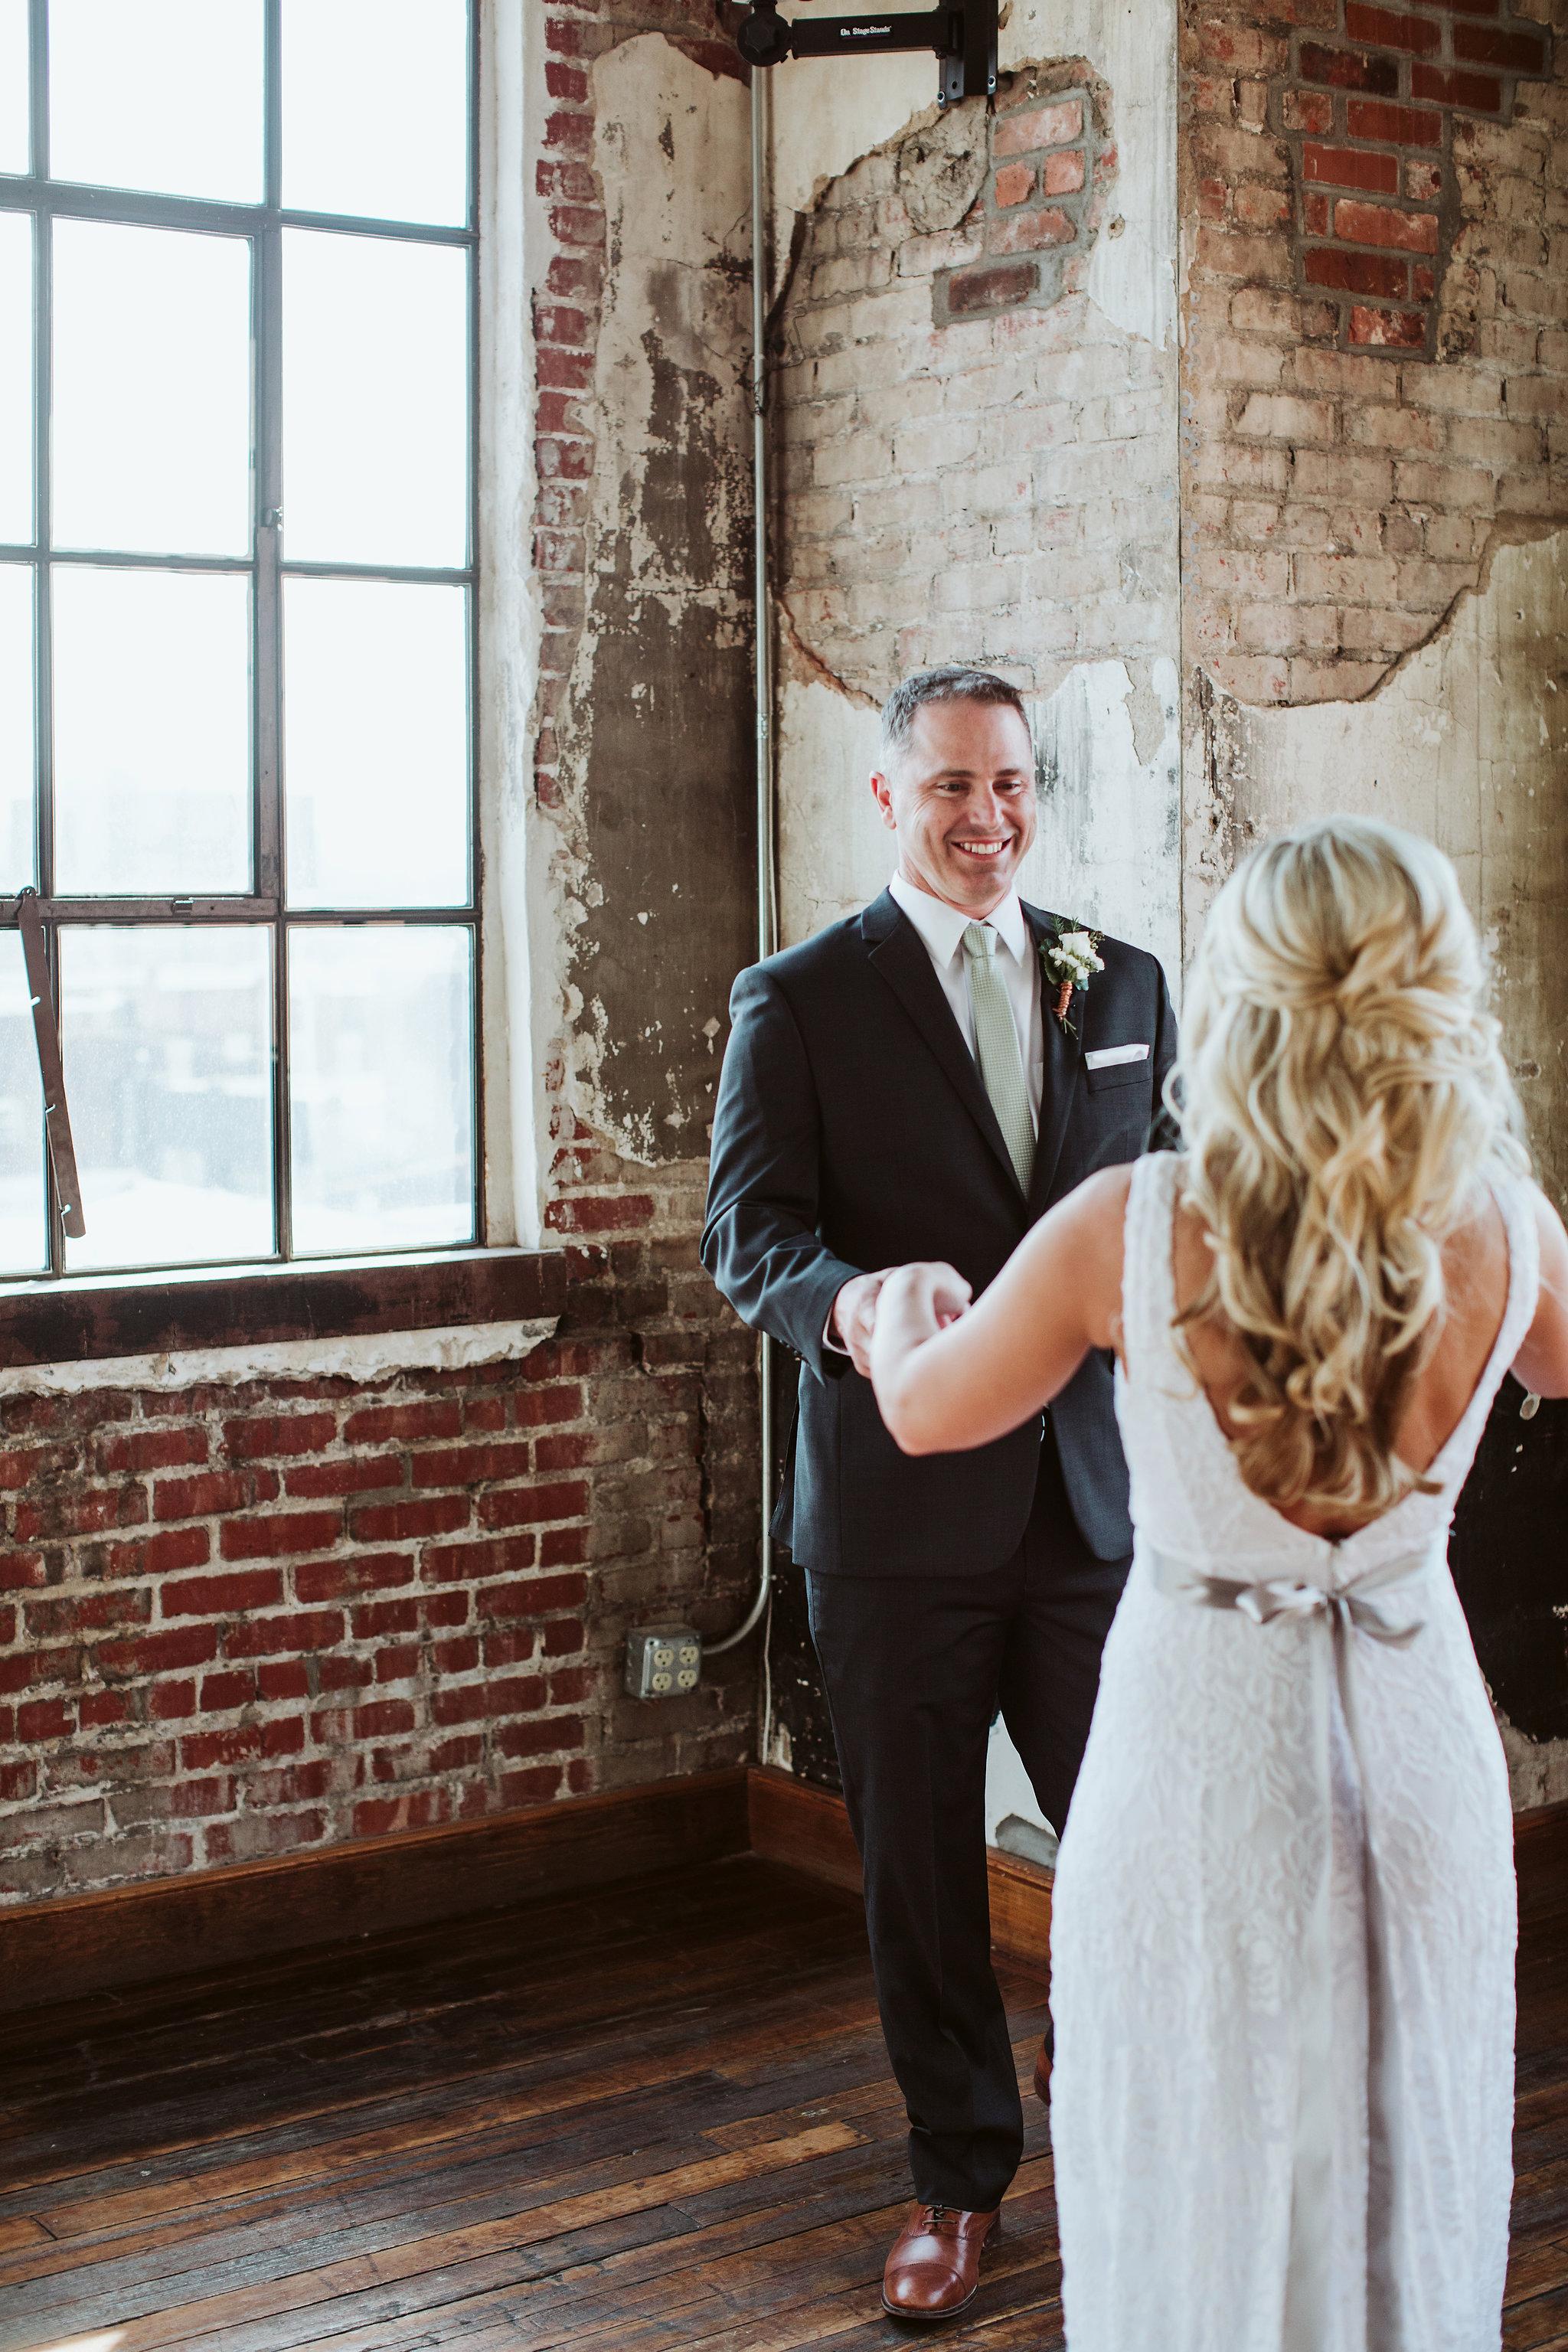 The Bride and The Bauer Wedding_Cinder Block Brewery Wedding_Kindling Wedding Photography_08.JPG